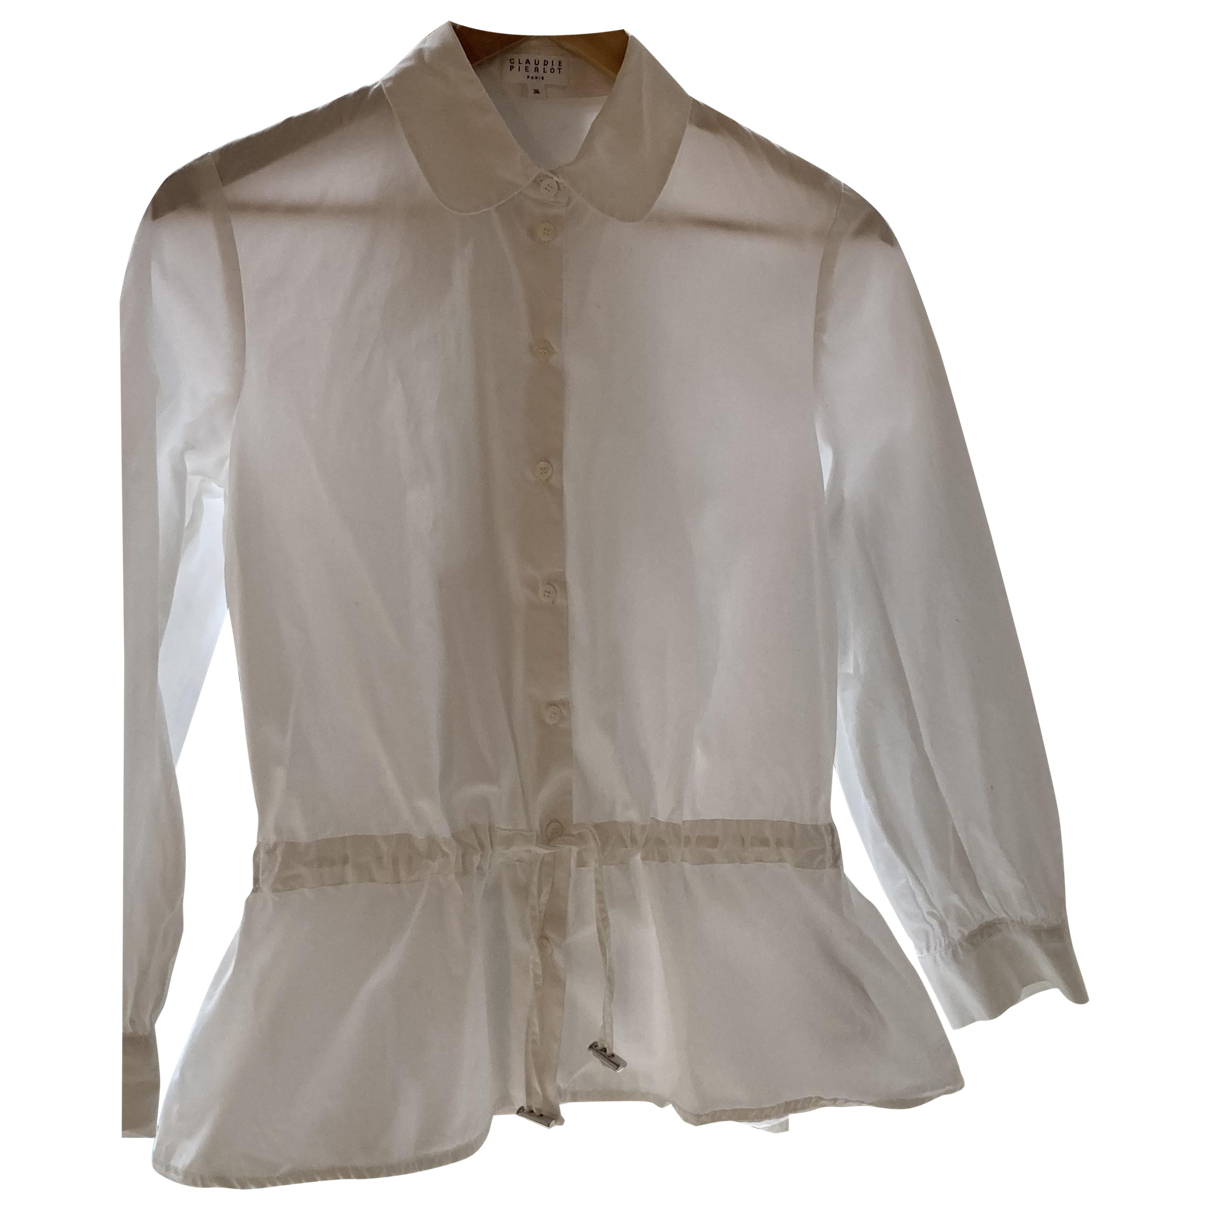 Claudie Pierlot N White Cotton  top for Women 36 FR